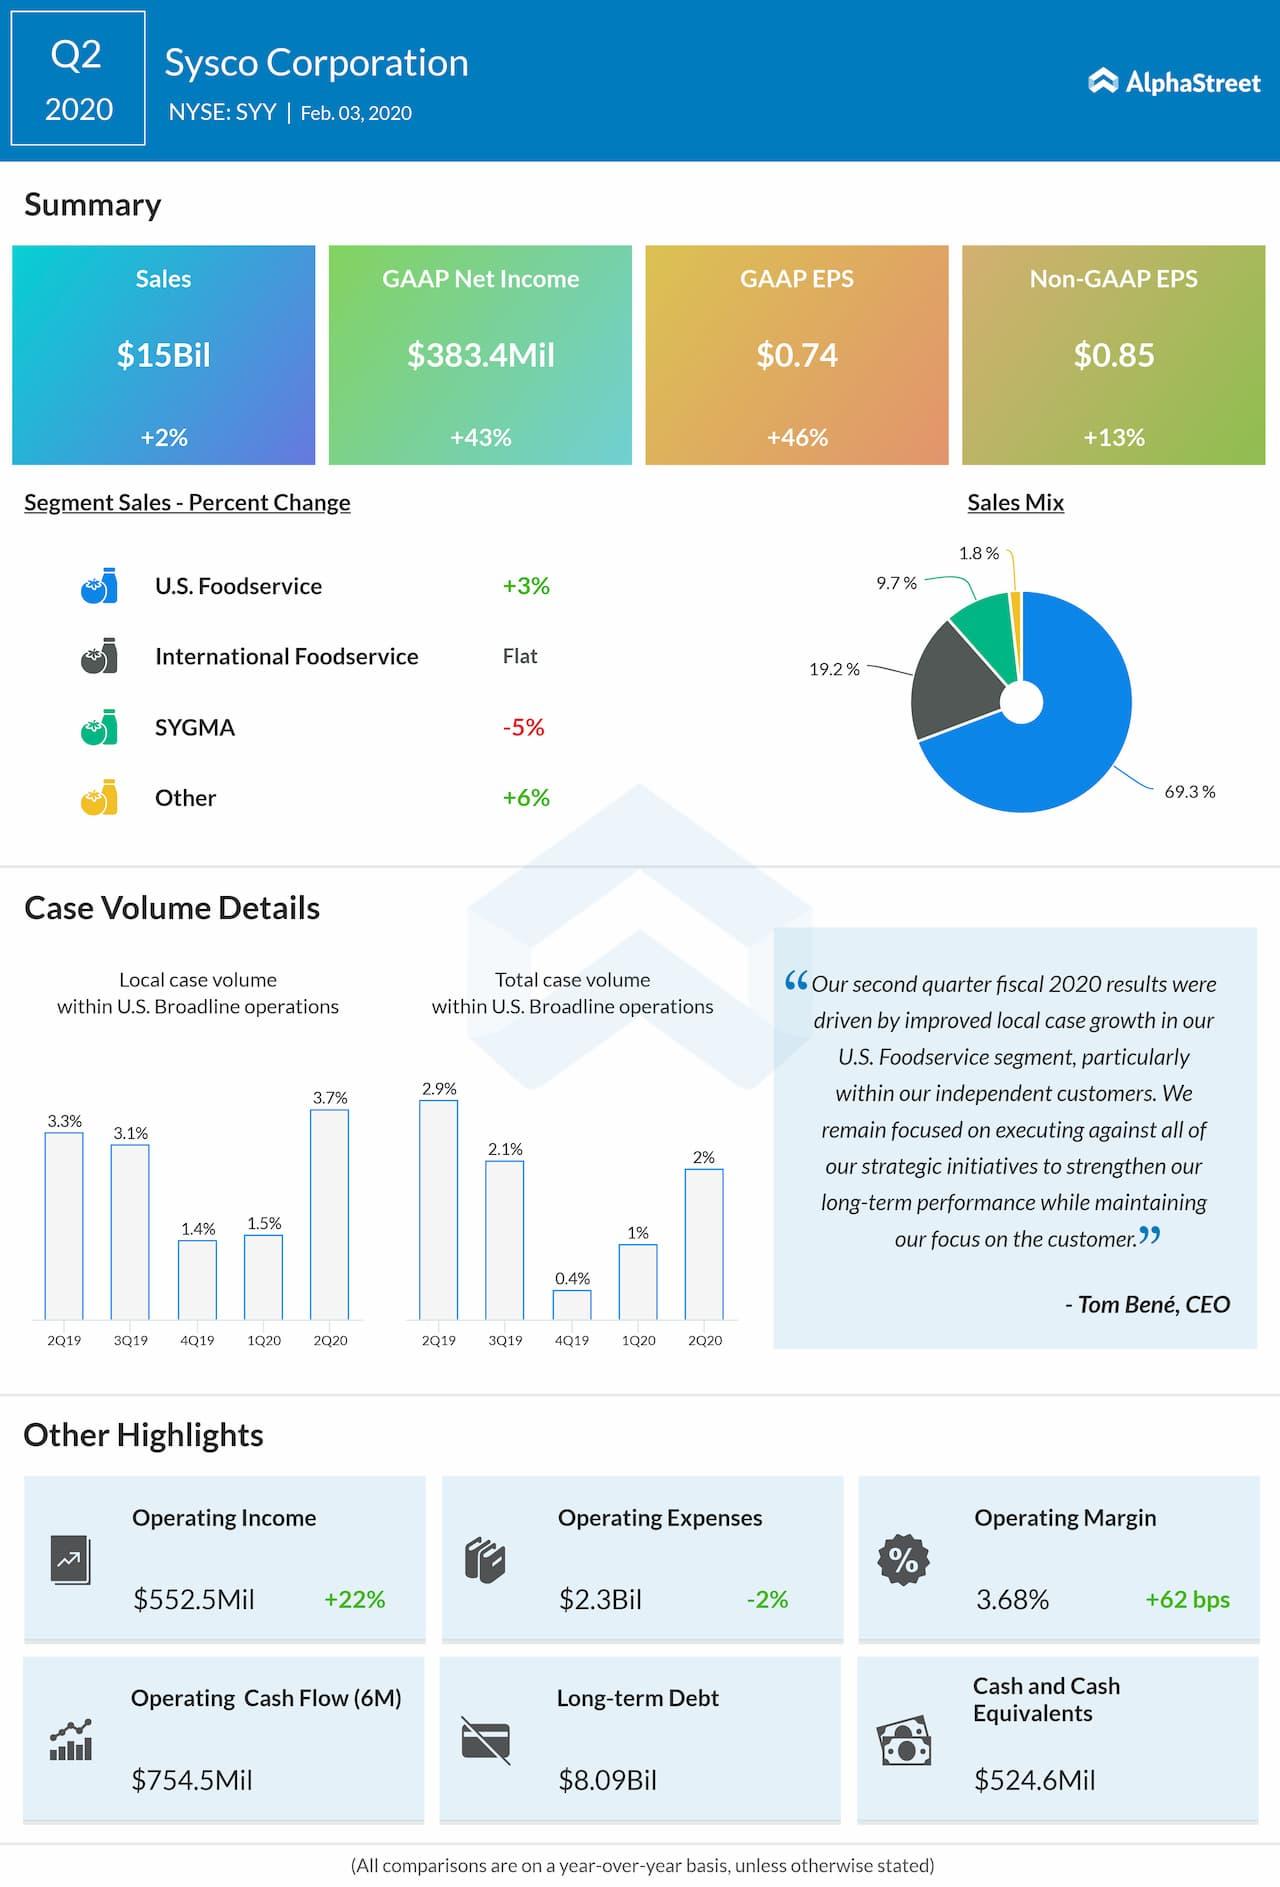 Sysco (SYY) Q2 2020 earnings results